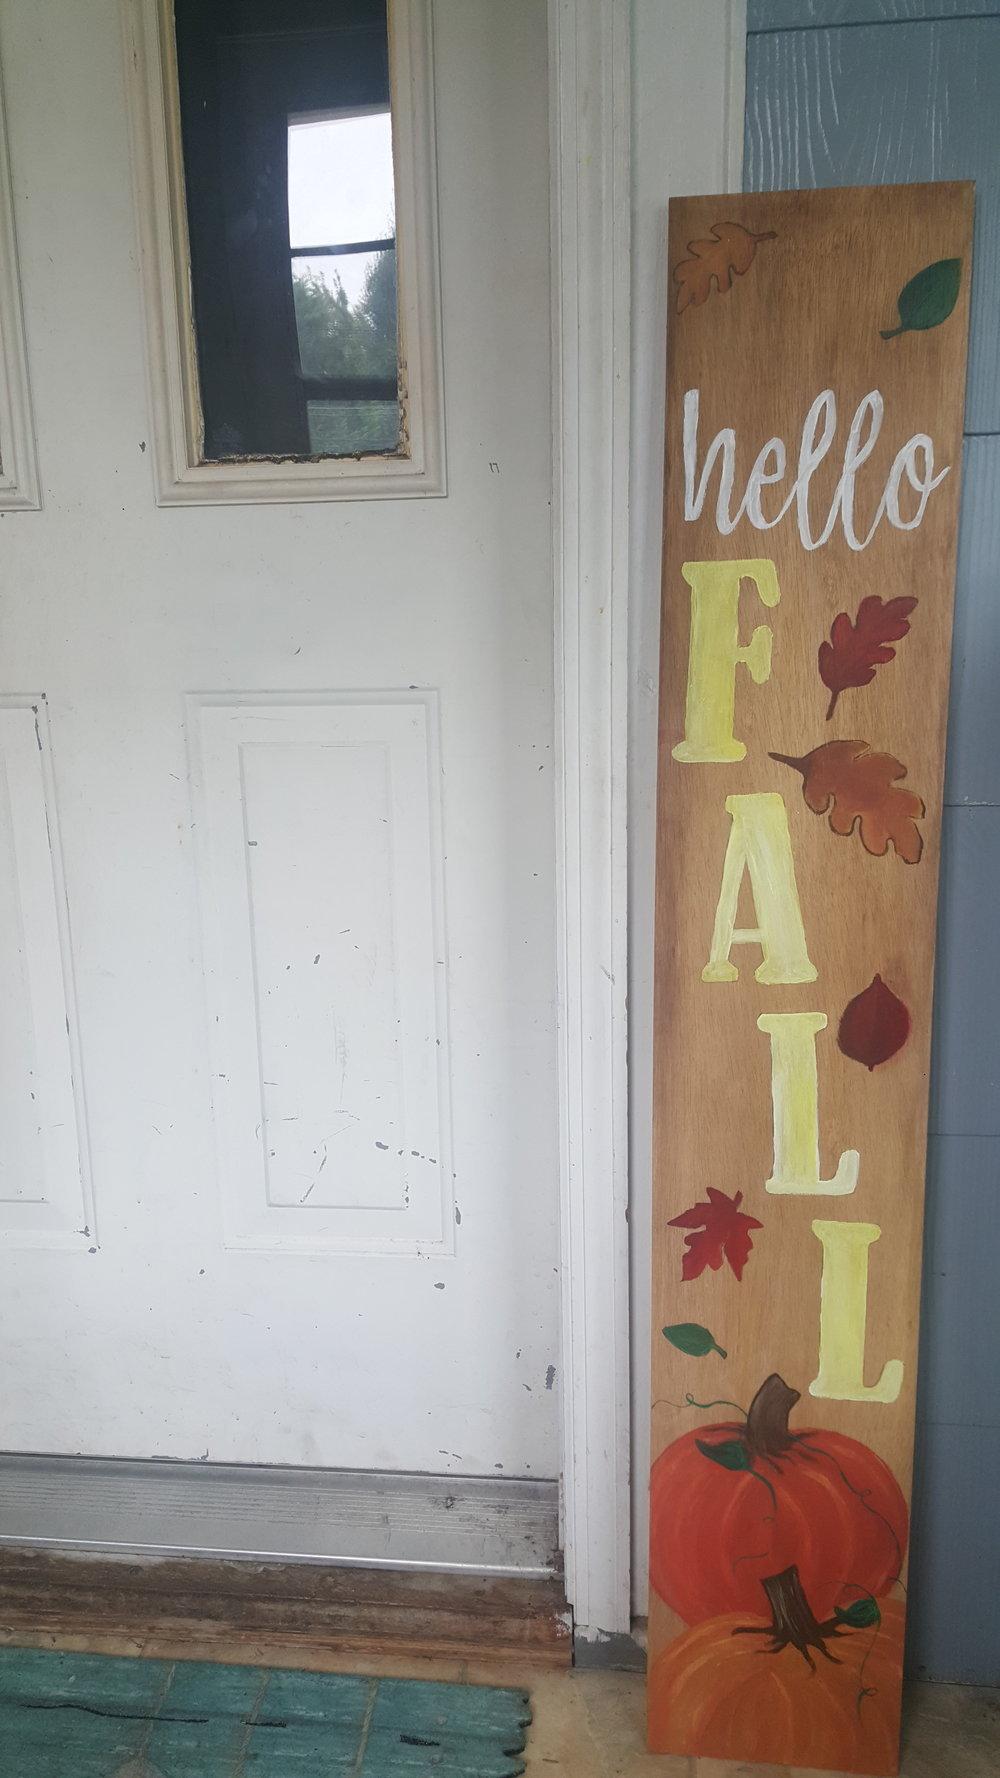 4 ft porch signs (endless design options!)